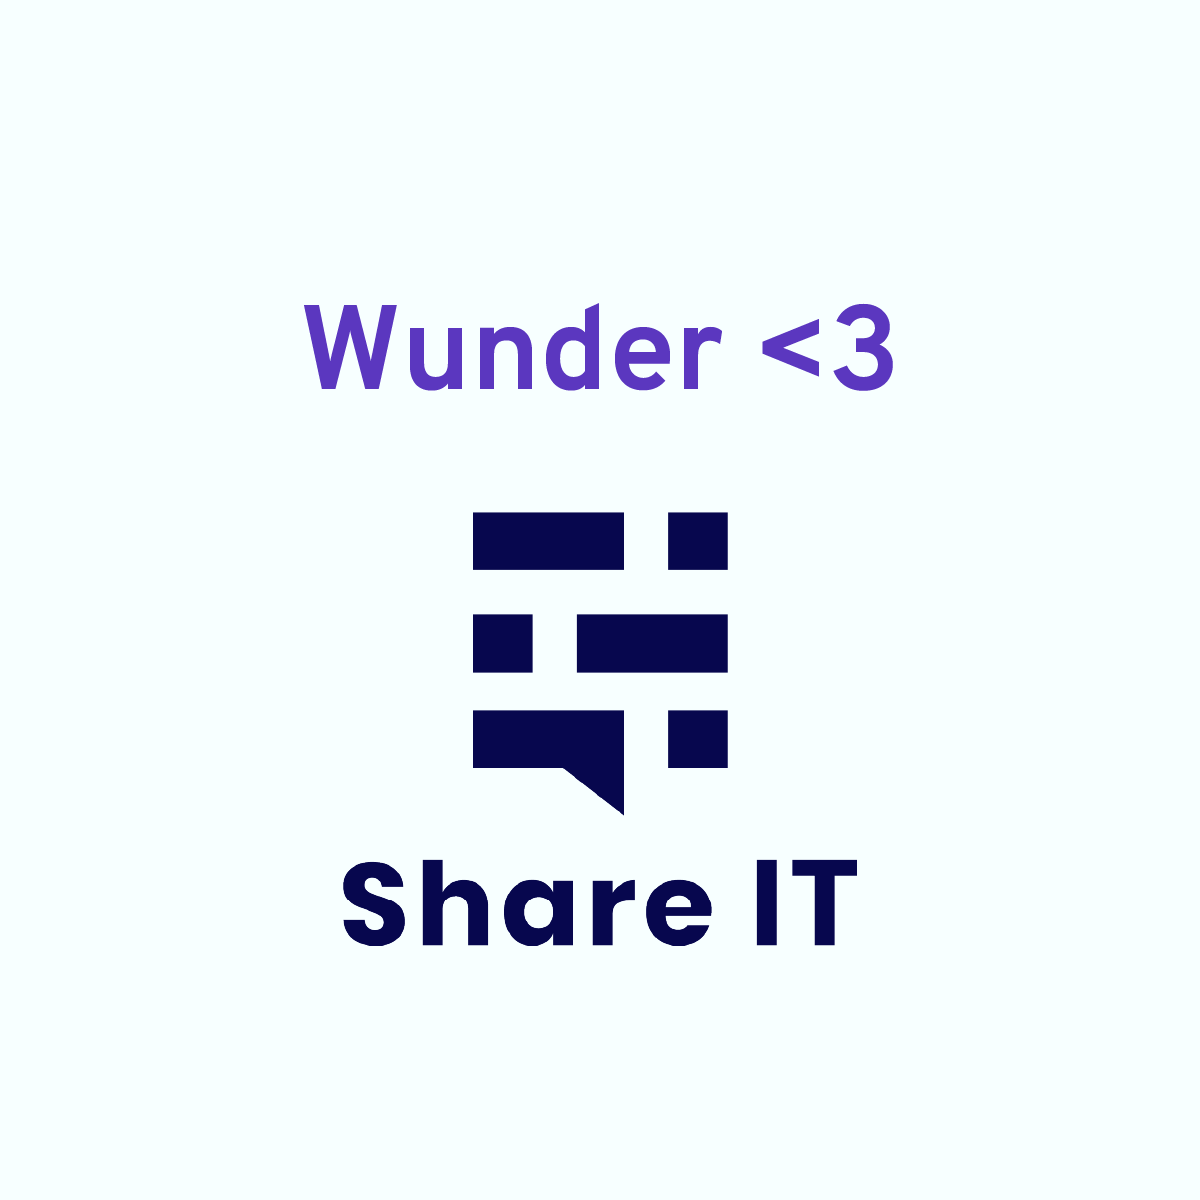 Wunder loves Share IT